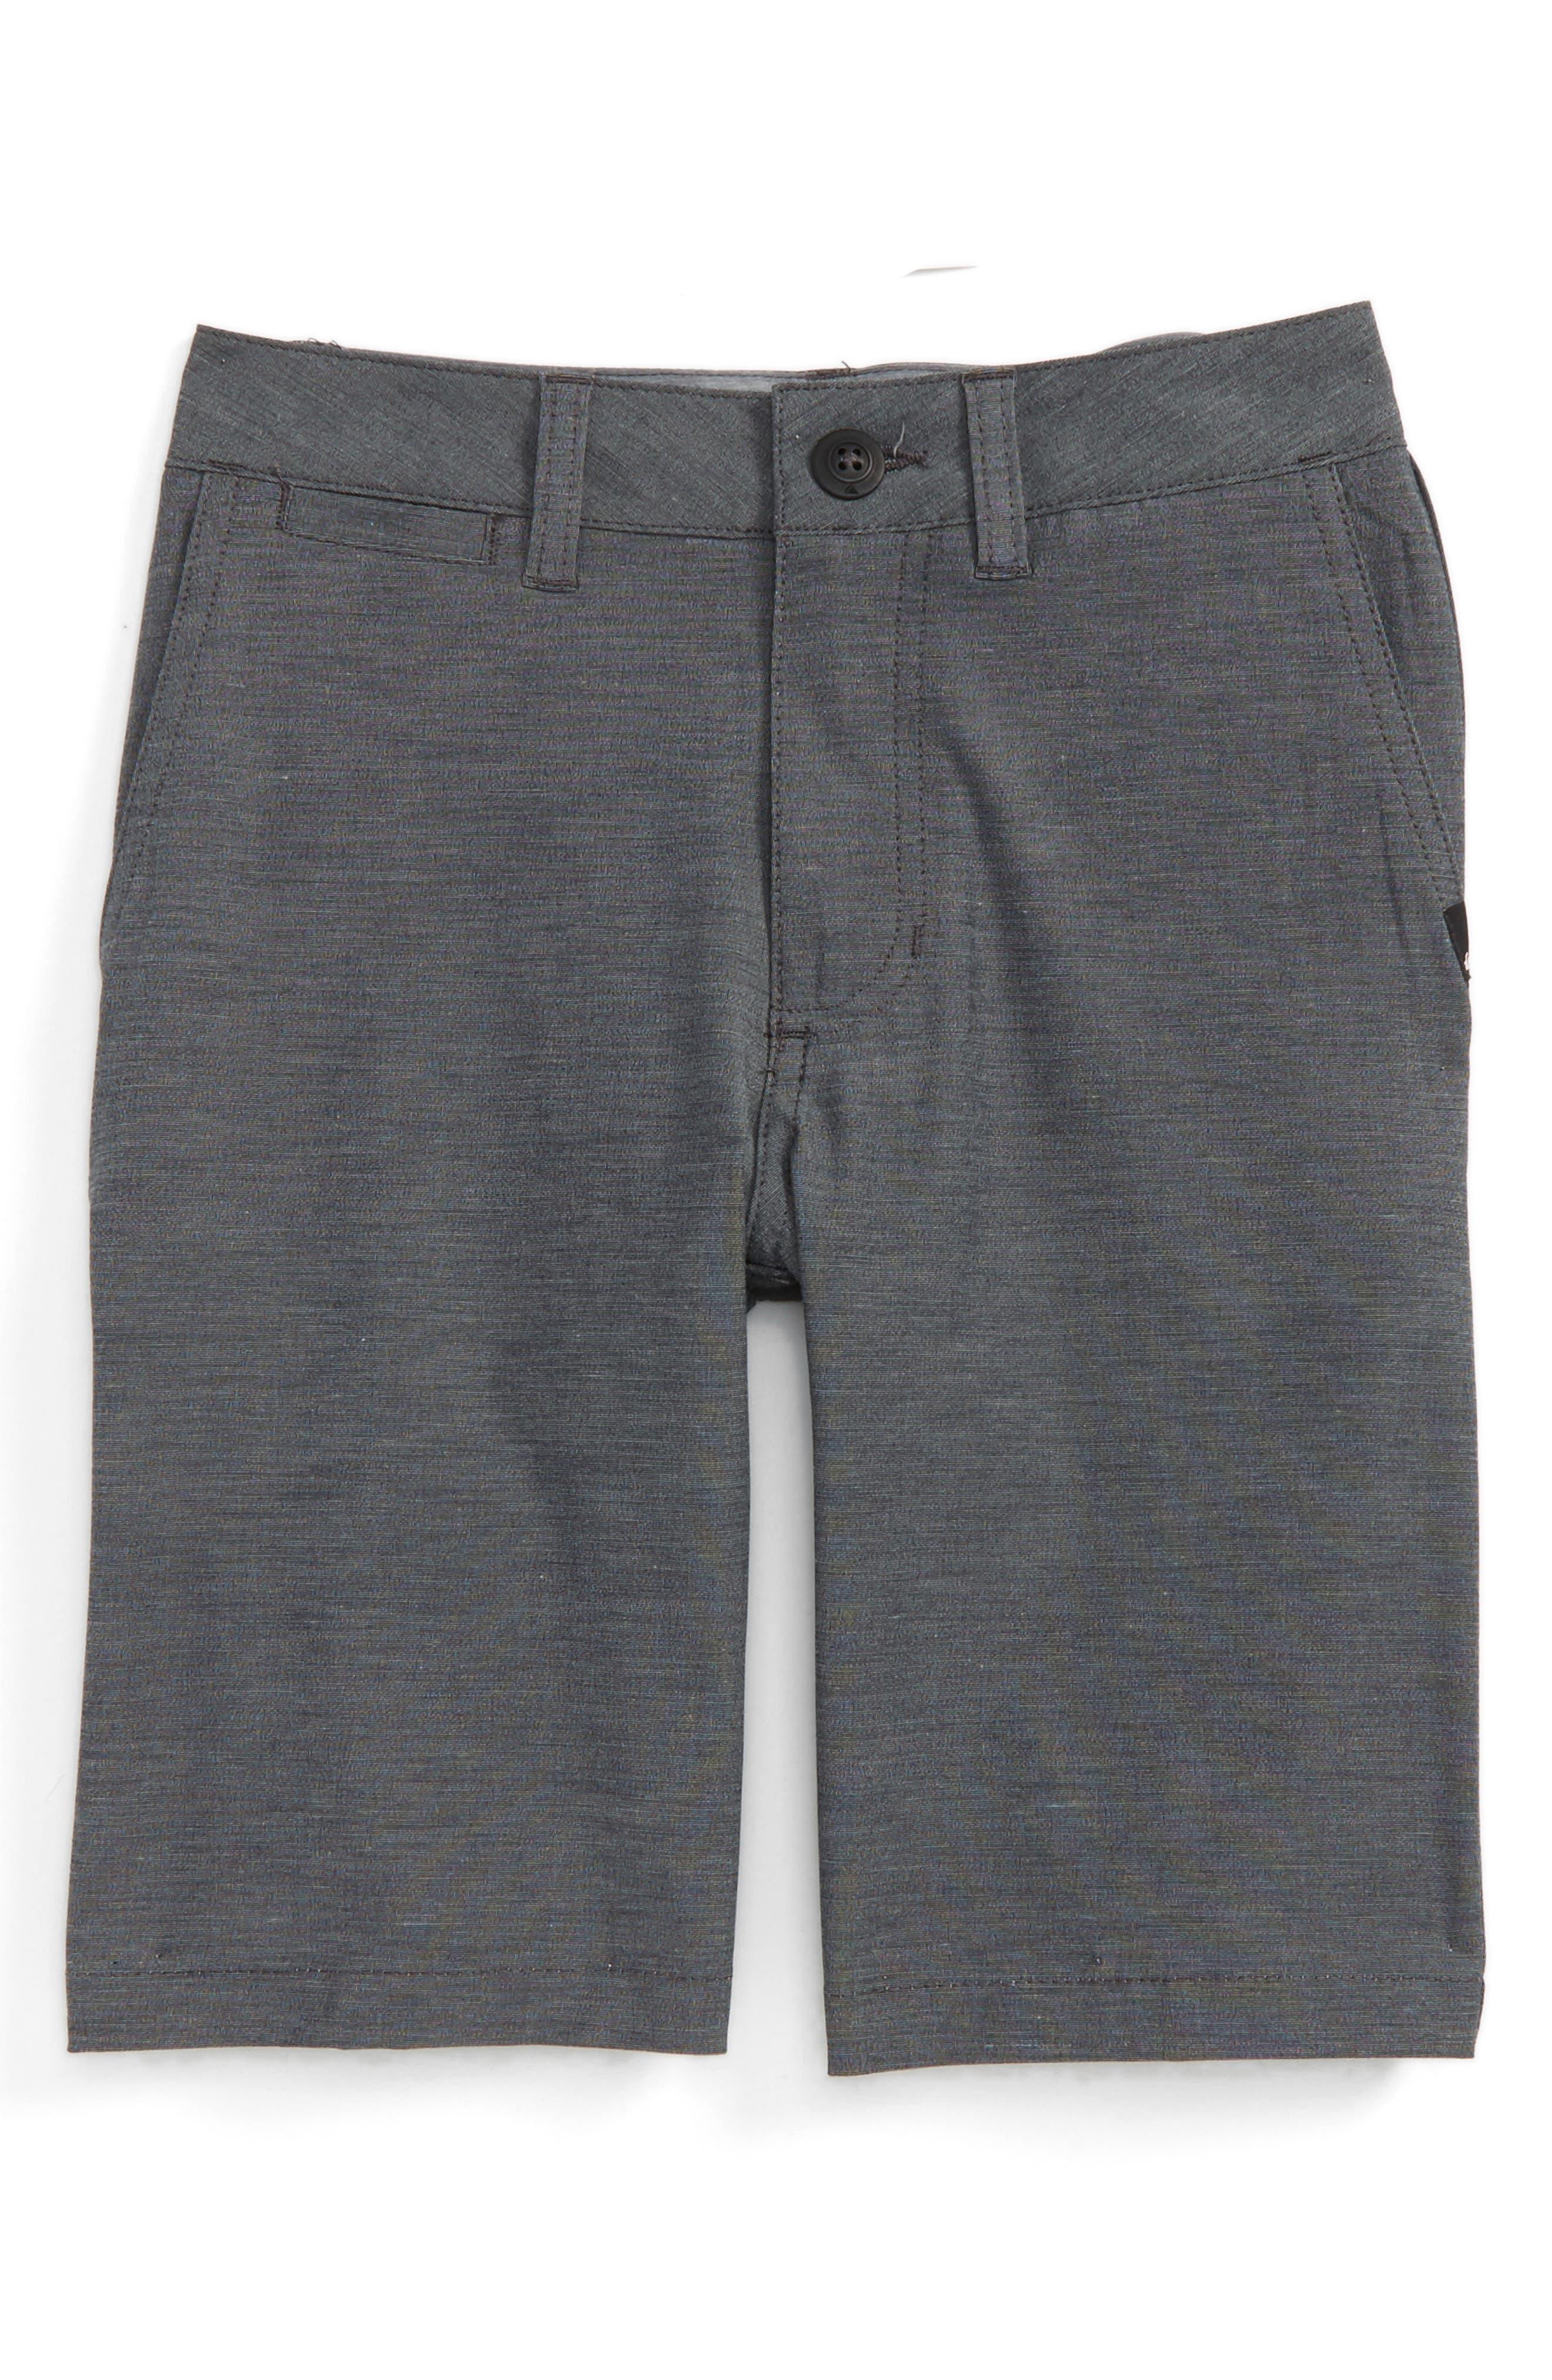 Quiksilver Amphibian Hybrid Shorts (Big Boys)